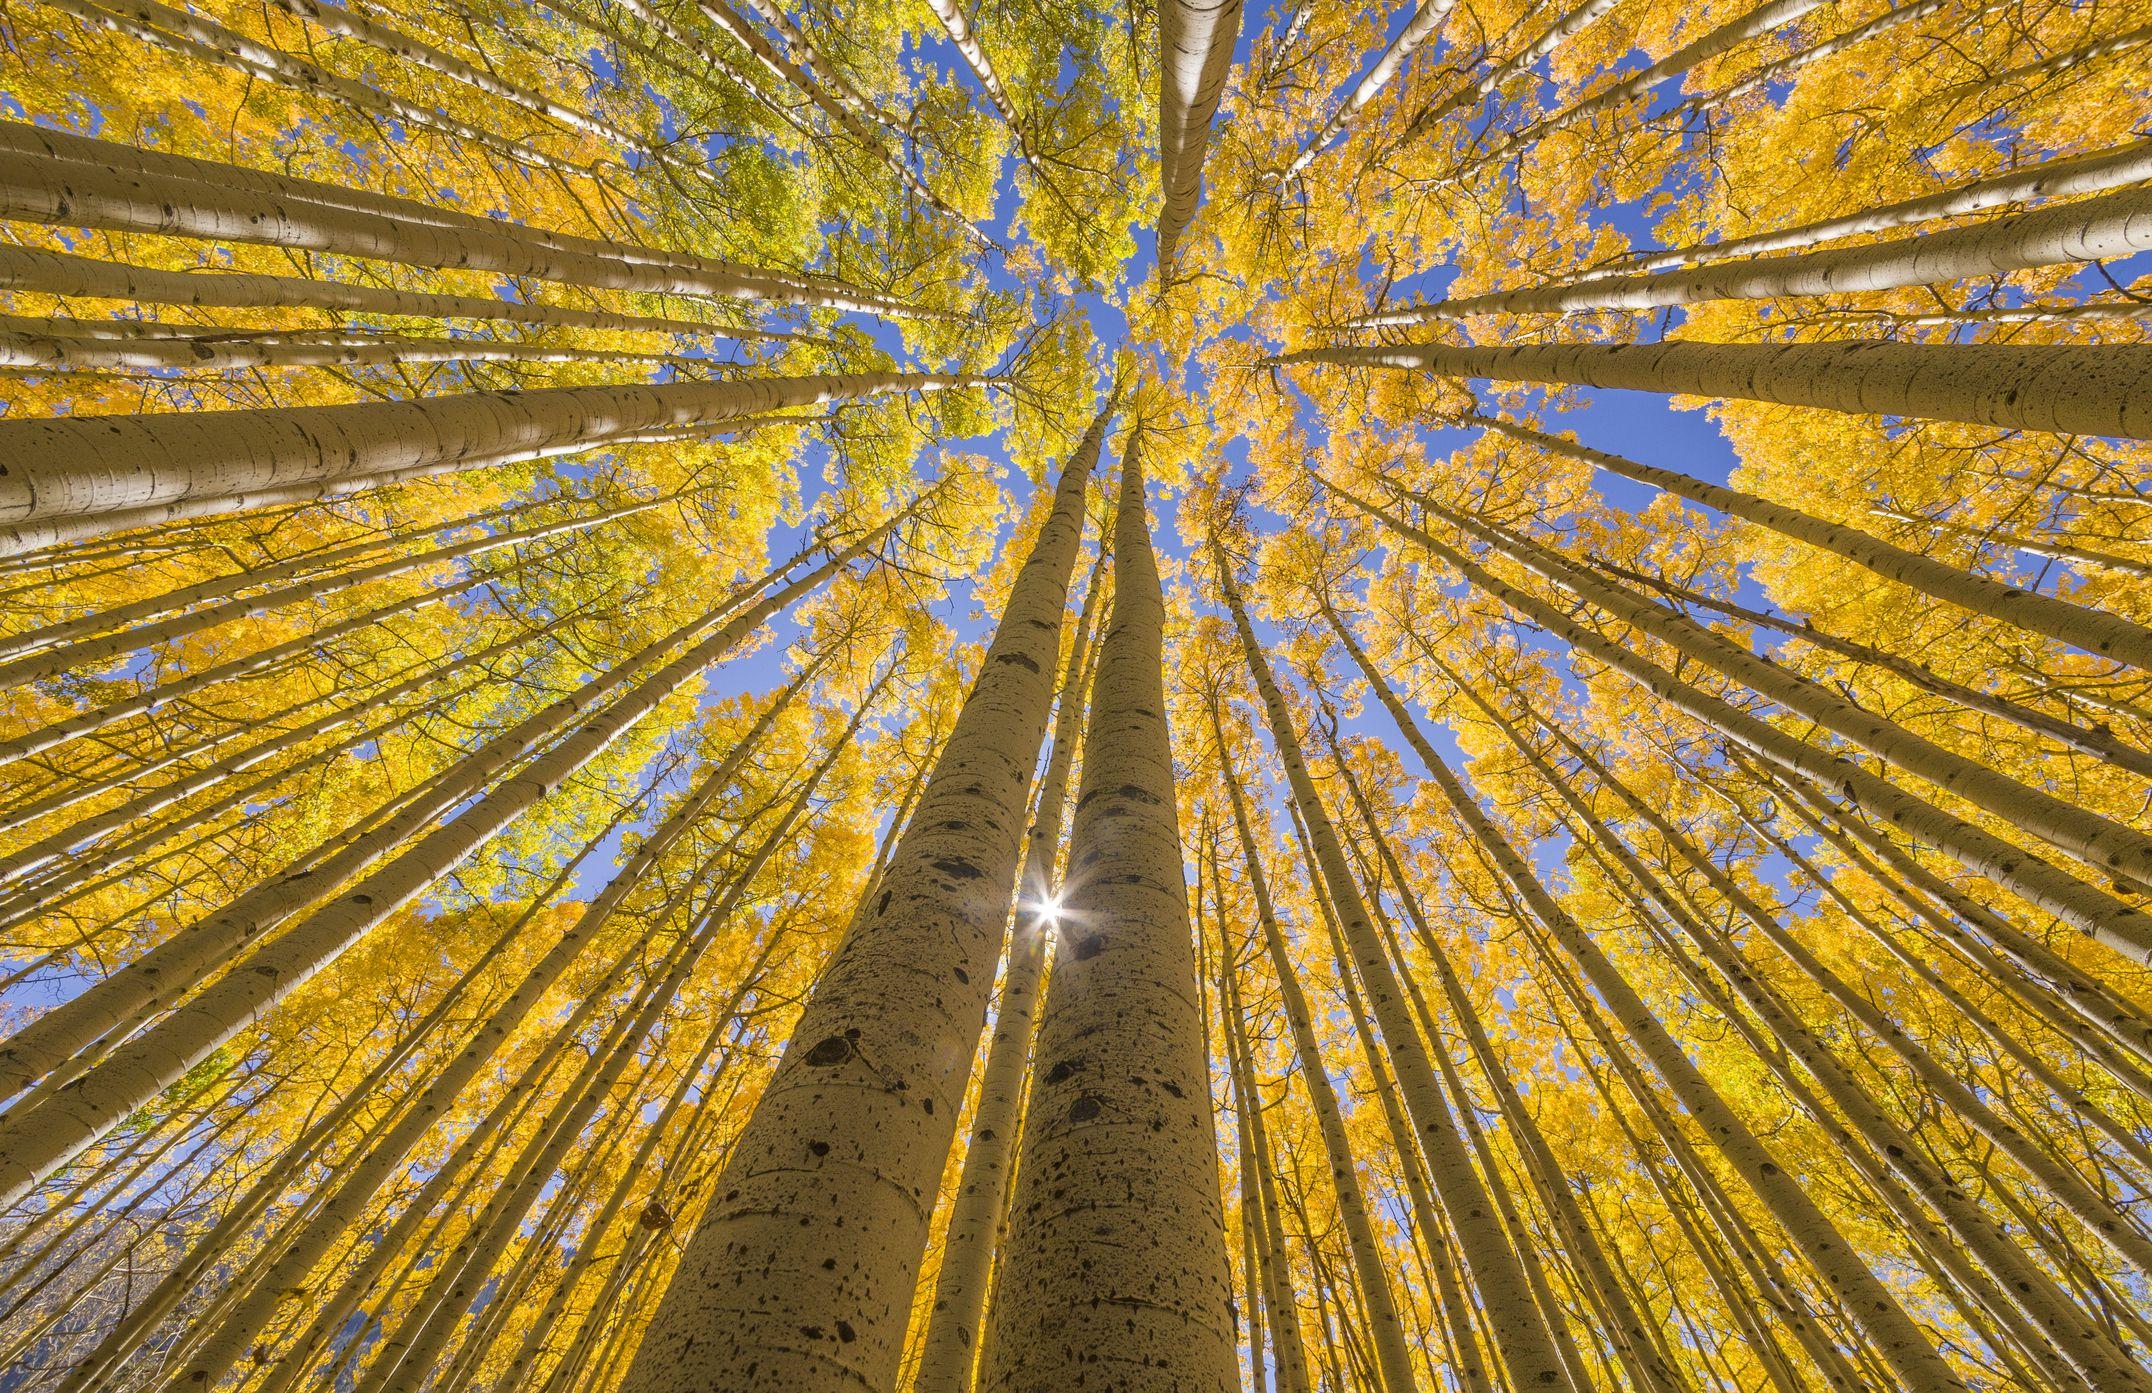 Aspen trees. San Juan National Forest, Rocky Mountains, Colorado